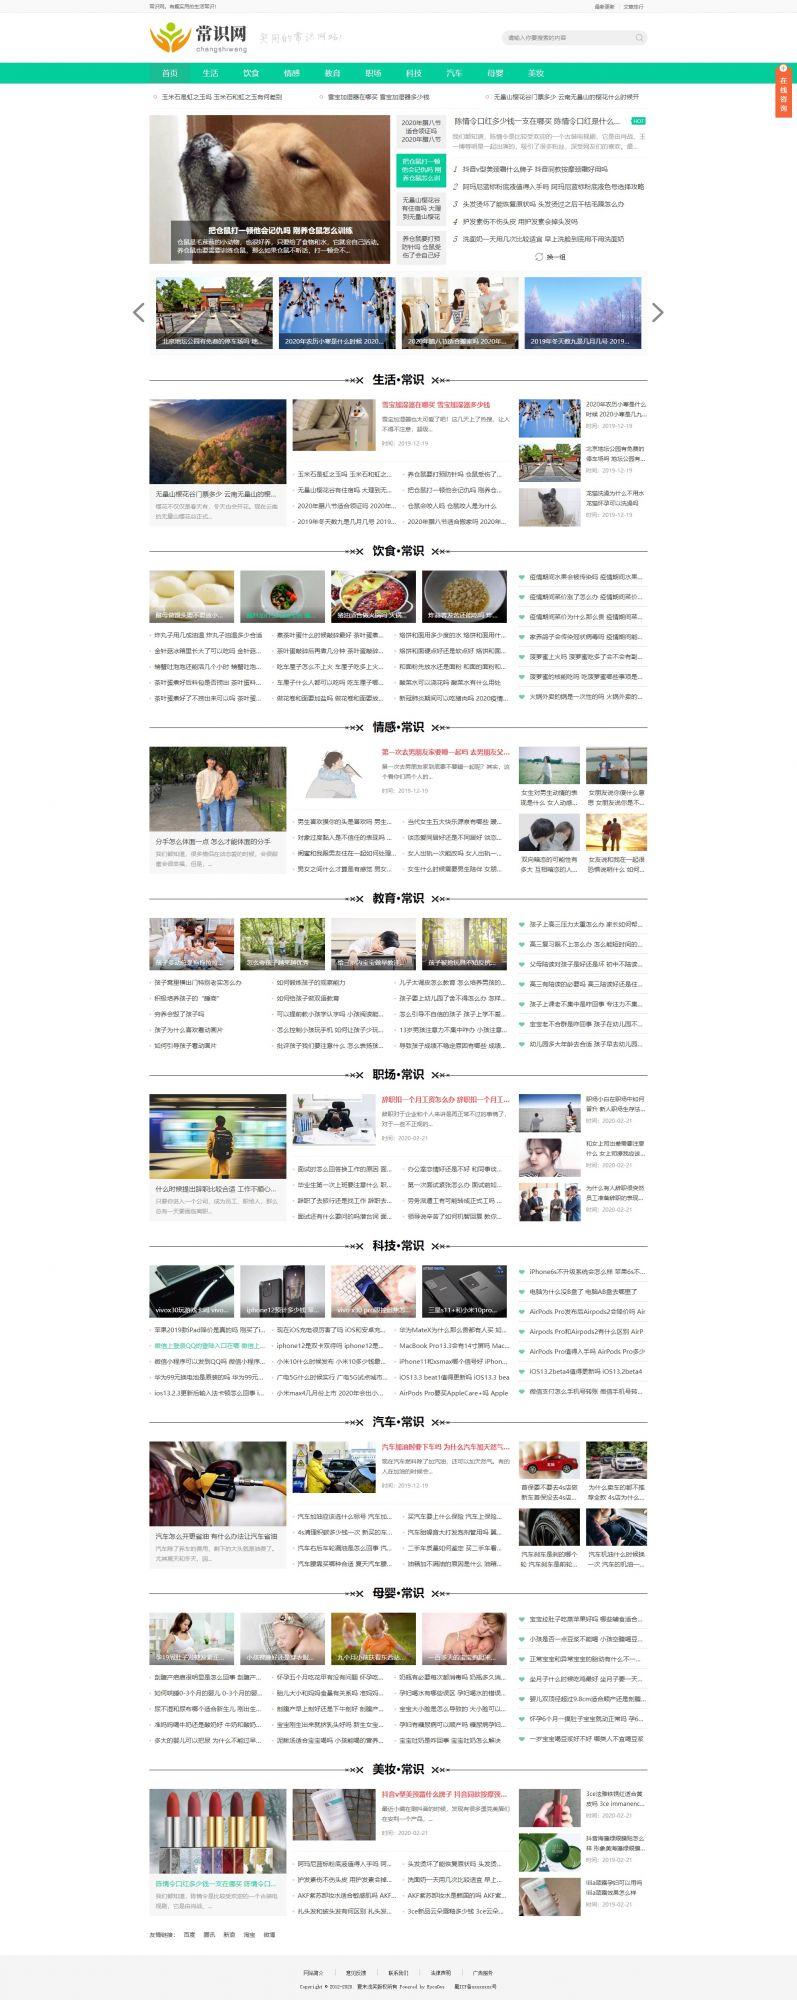 eyoucms自媒体新闻资讯类网站模板分享